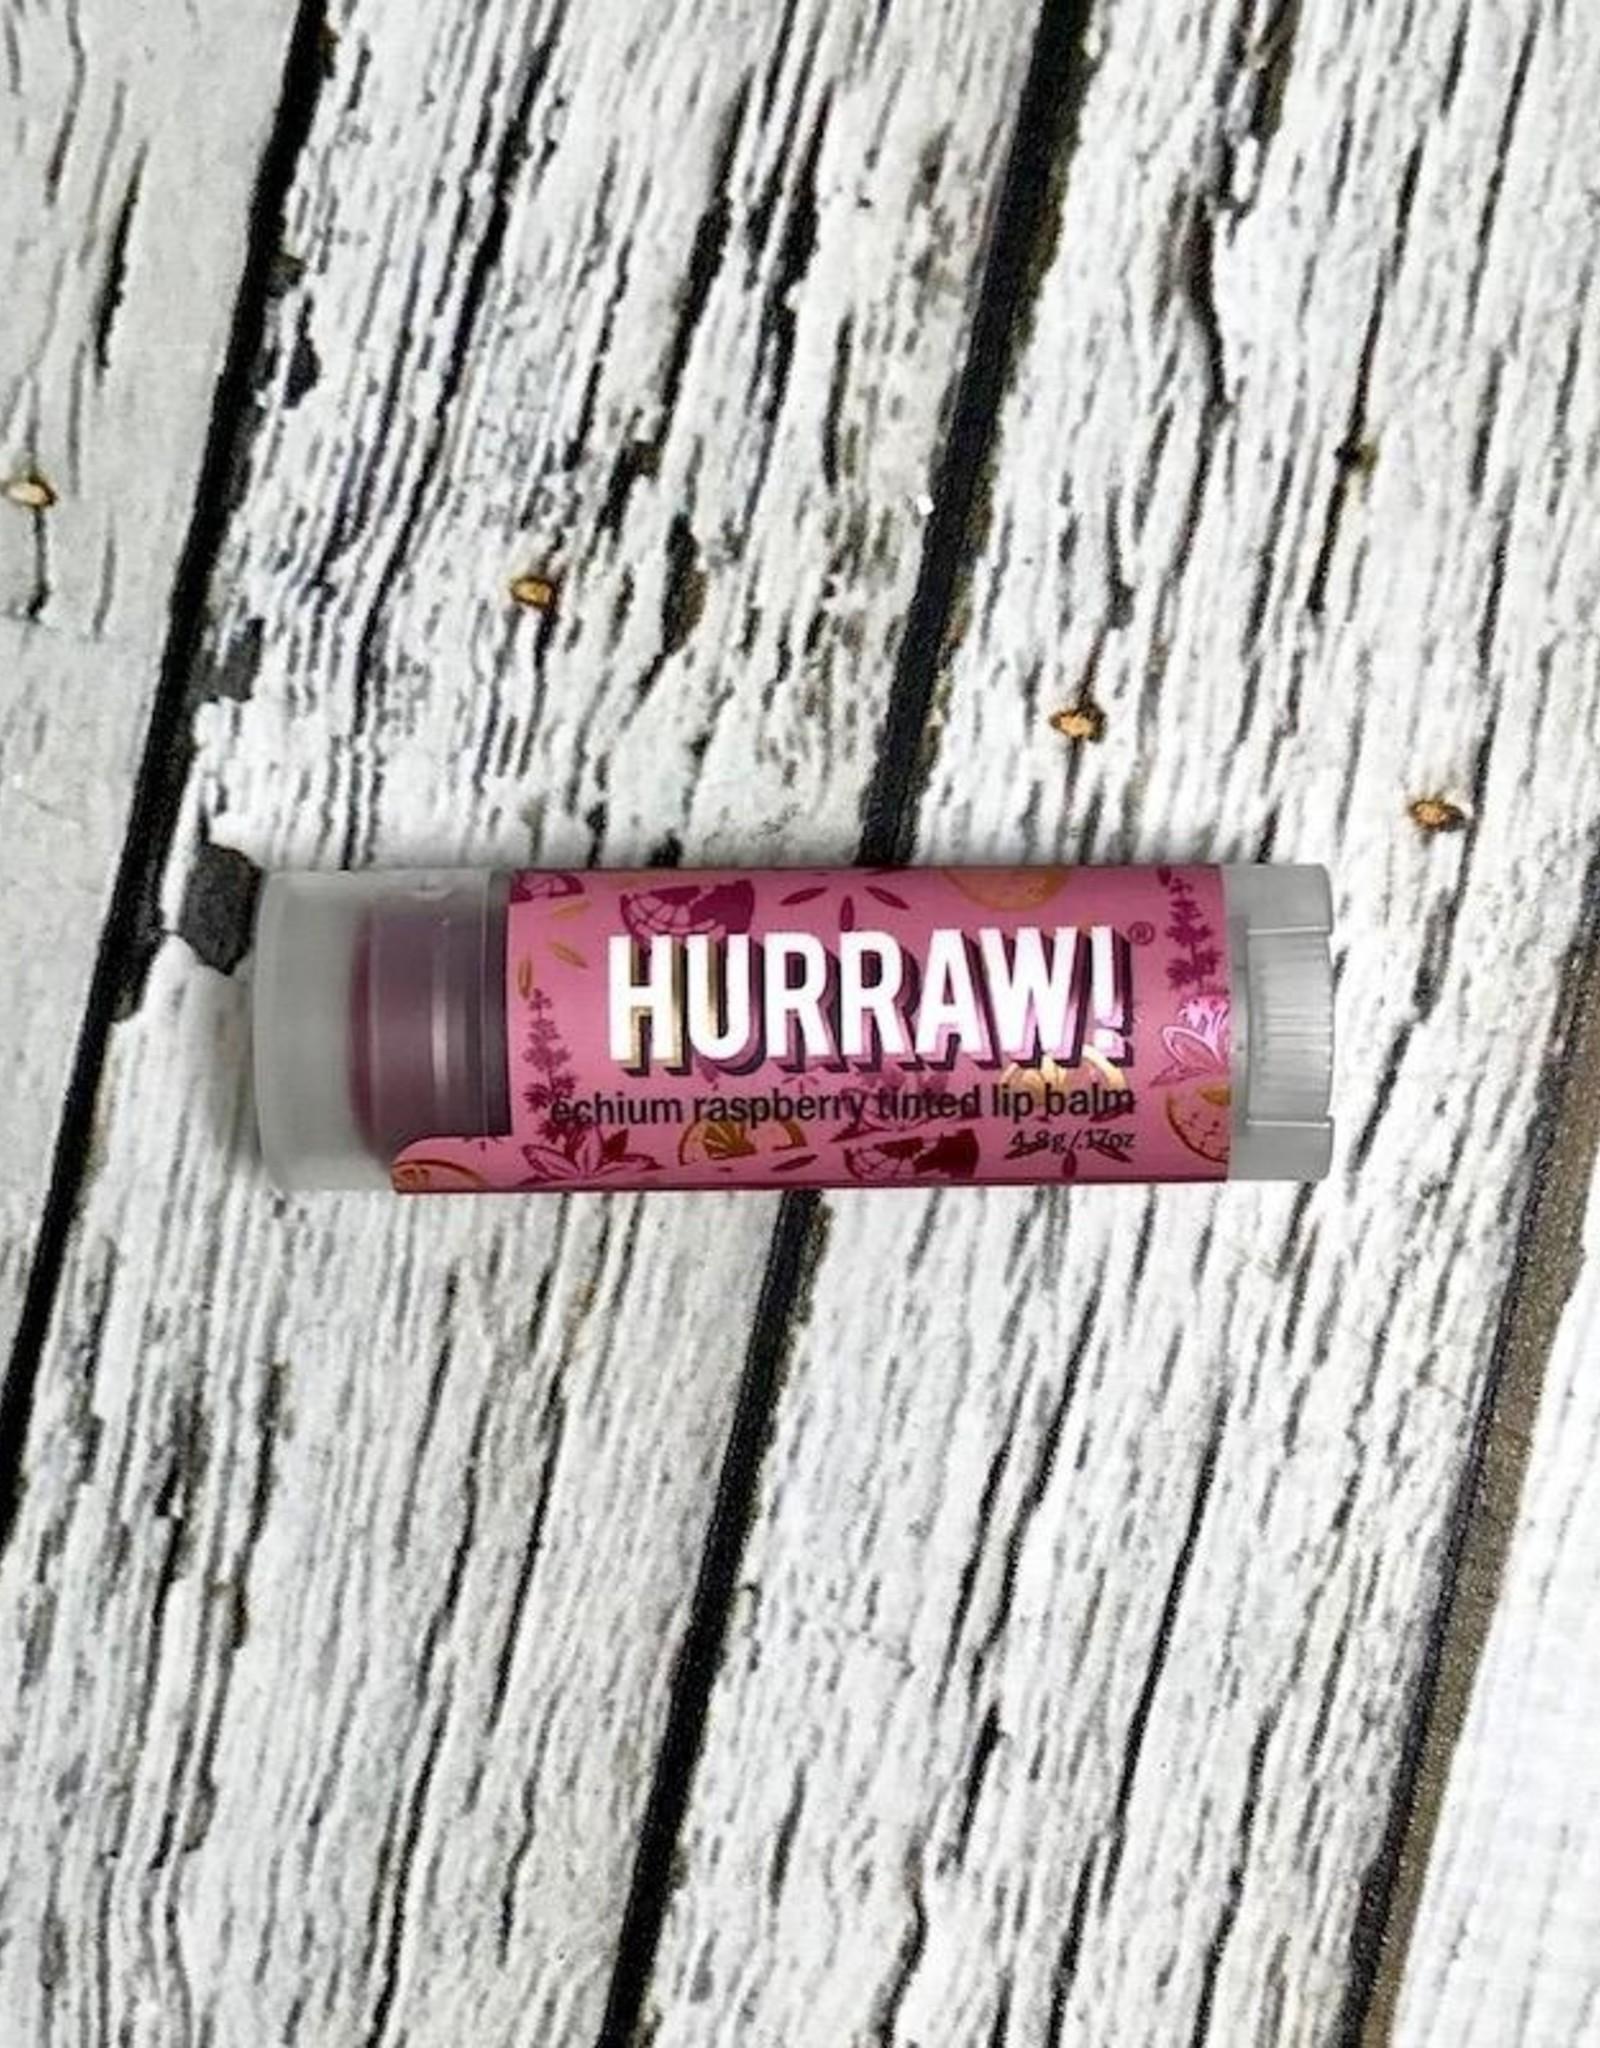 Echium Raspberry Tinted Lip Balm